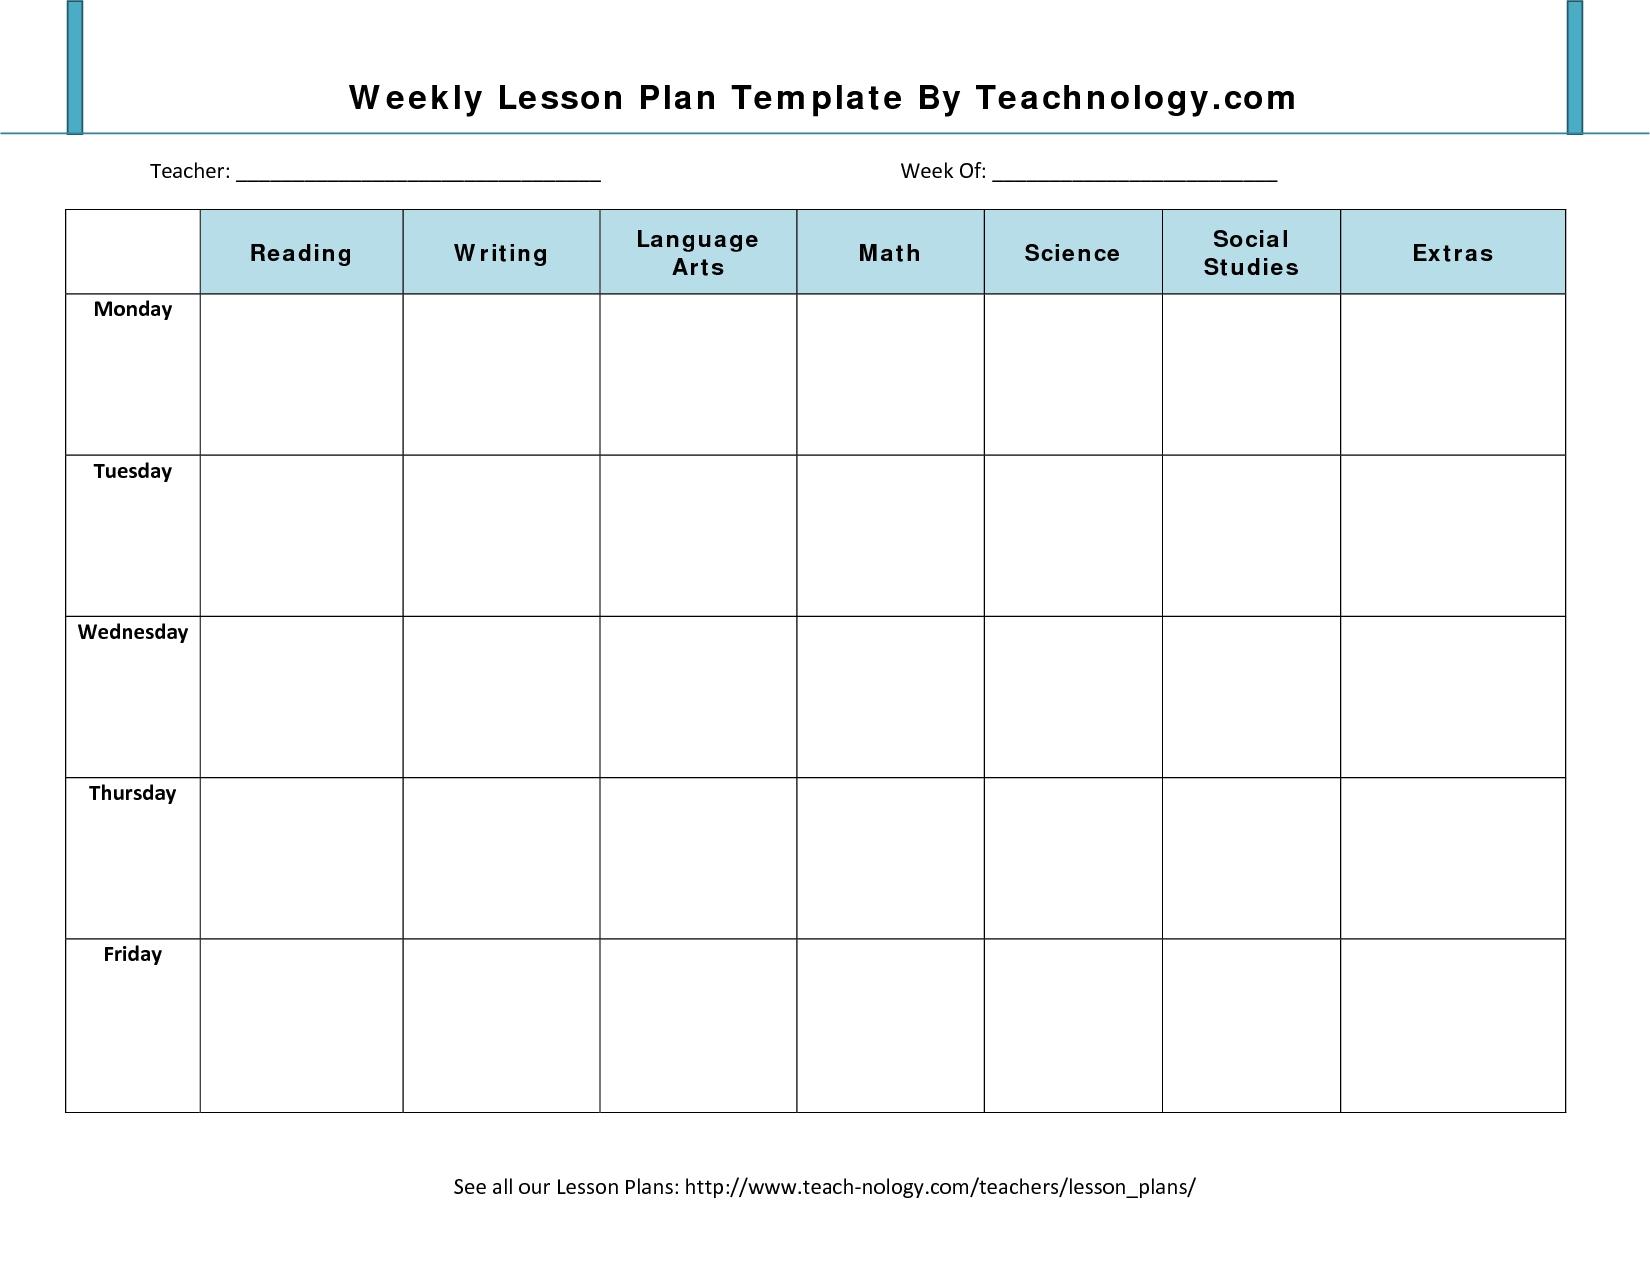 Weekly Calendar Lesson Plan Template | Jazz Gear regarding Weekly Calander Lesson Plan Template